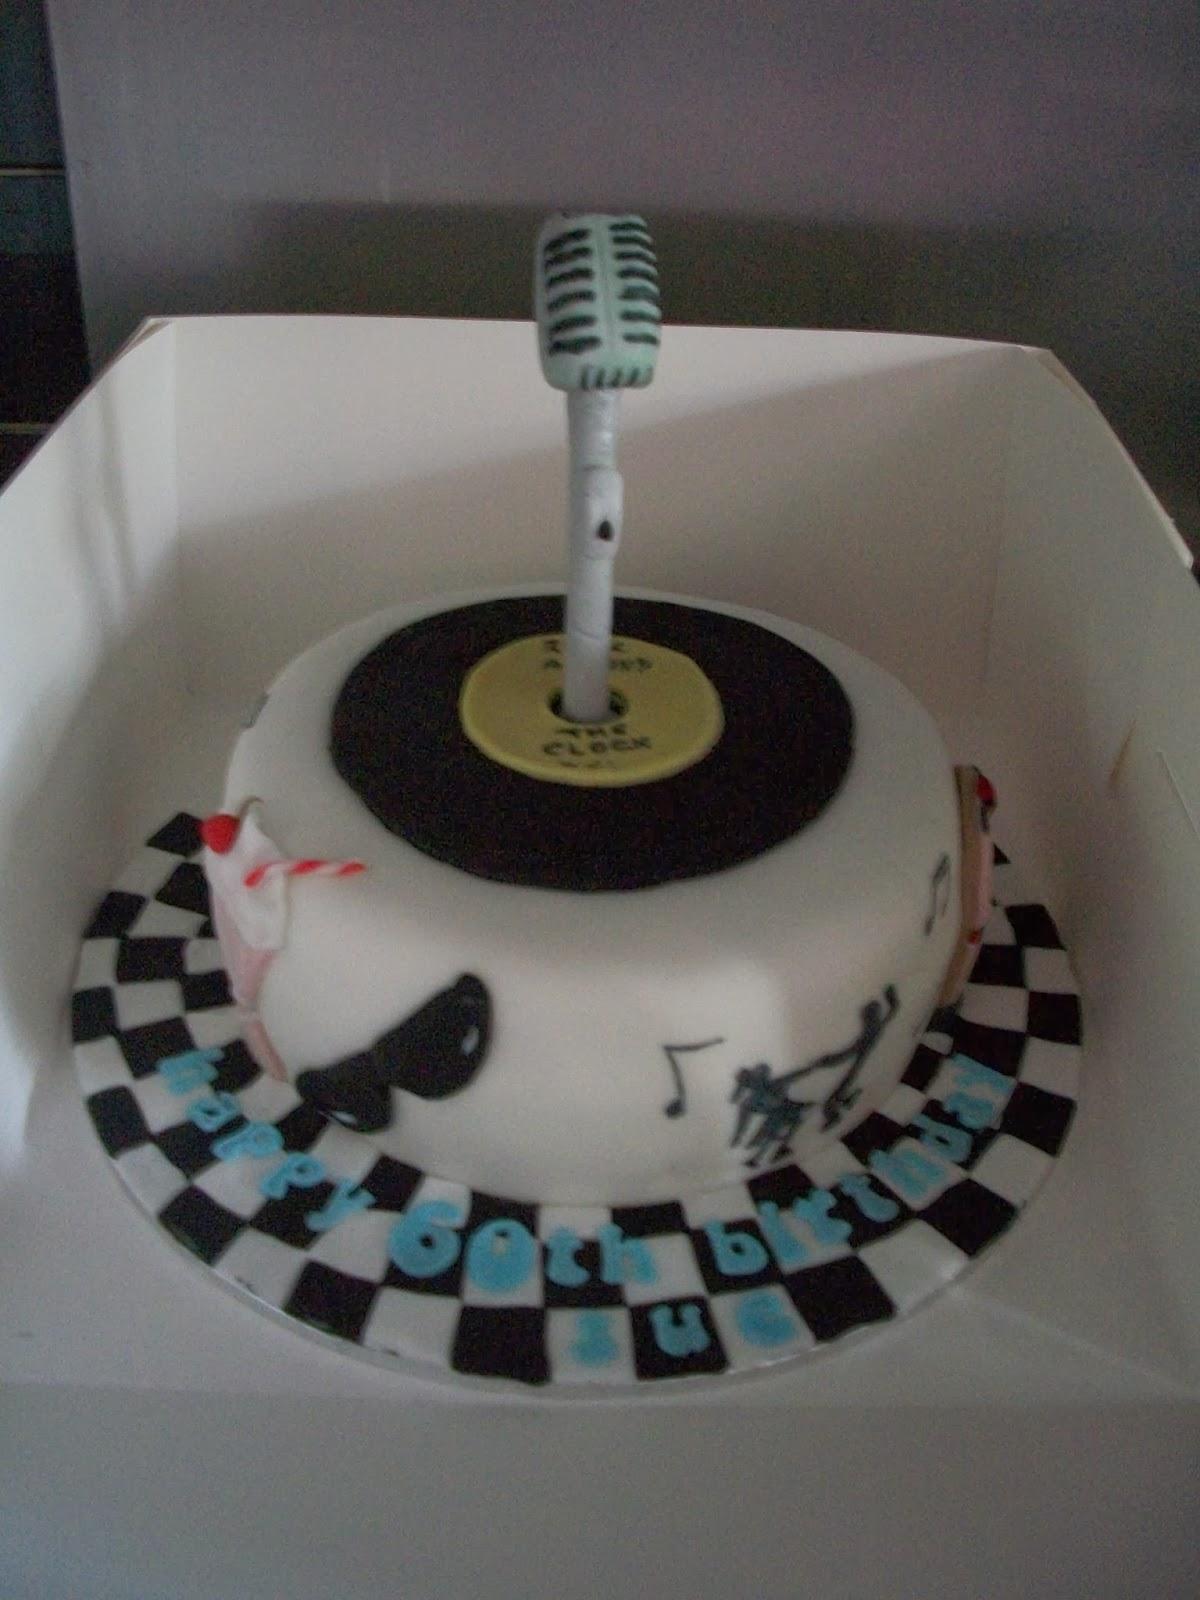 This Birthday Cake Was Rockin Rollin At Its Theme Night Jpg 1200x1600 50s